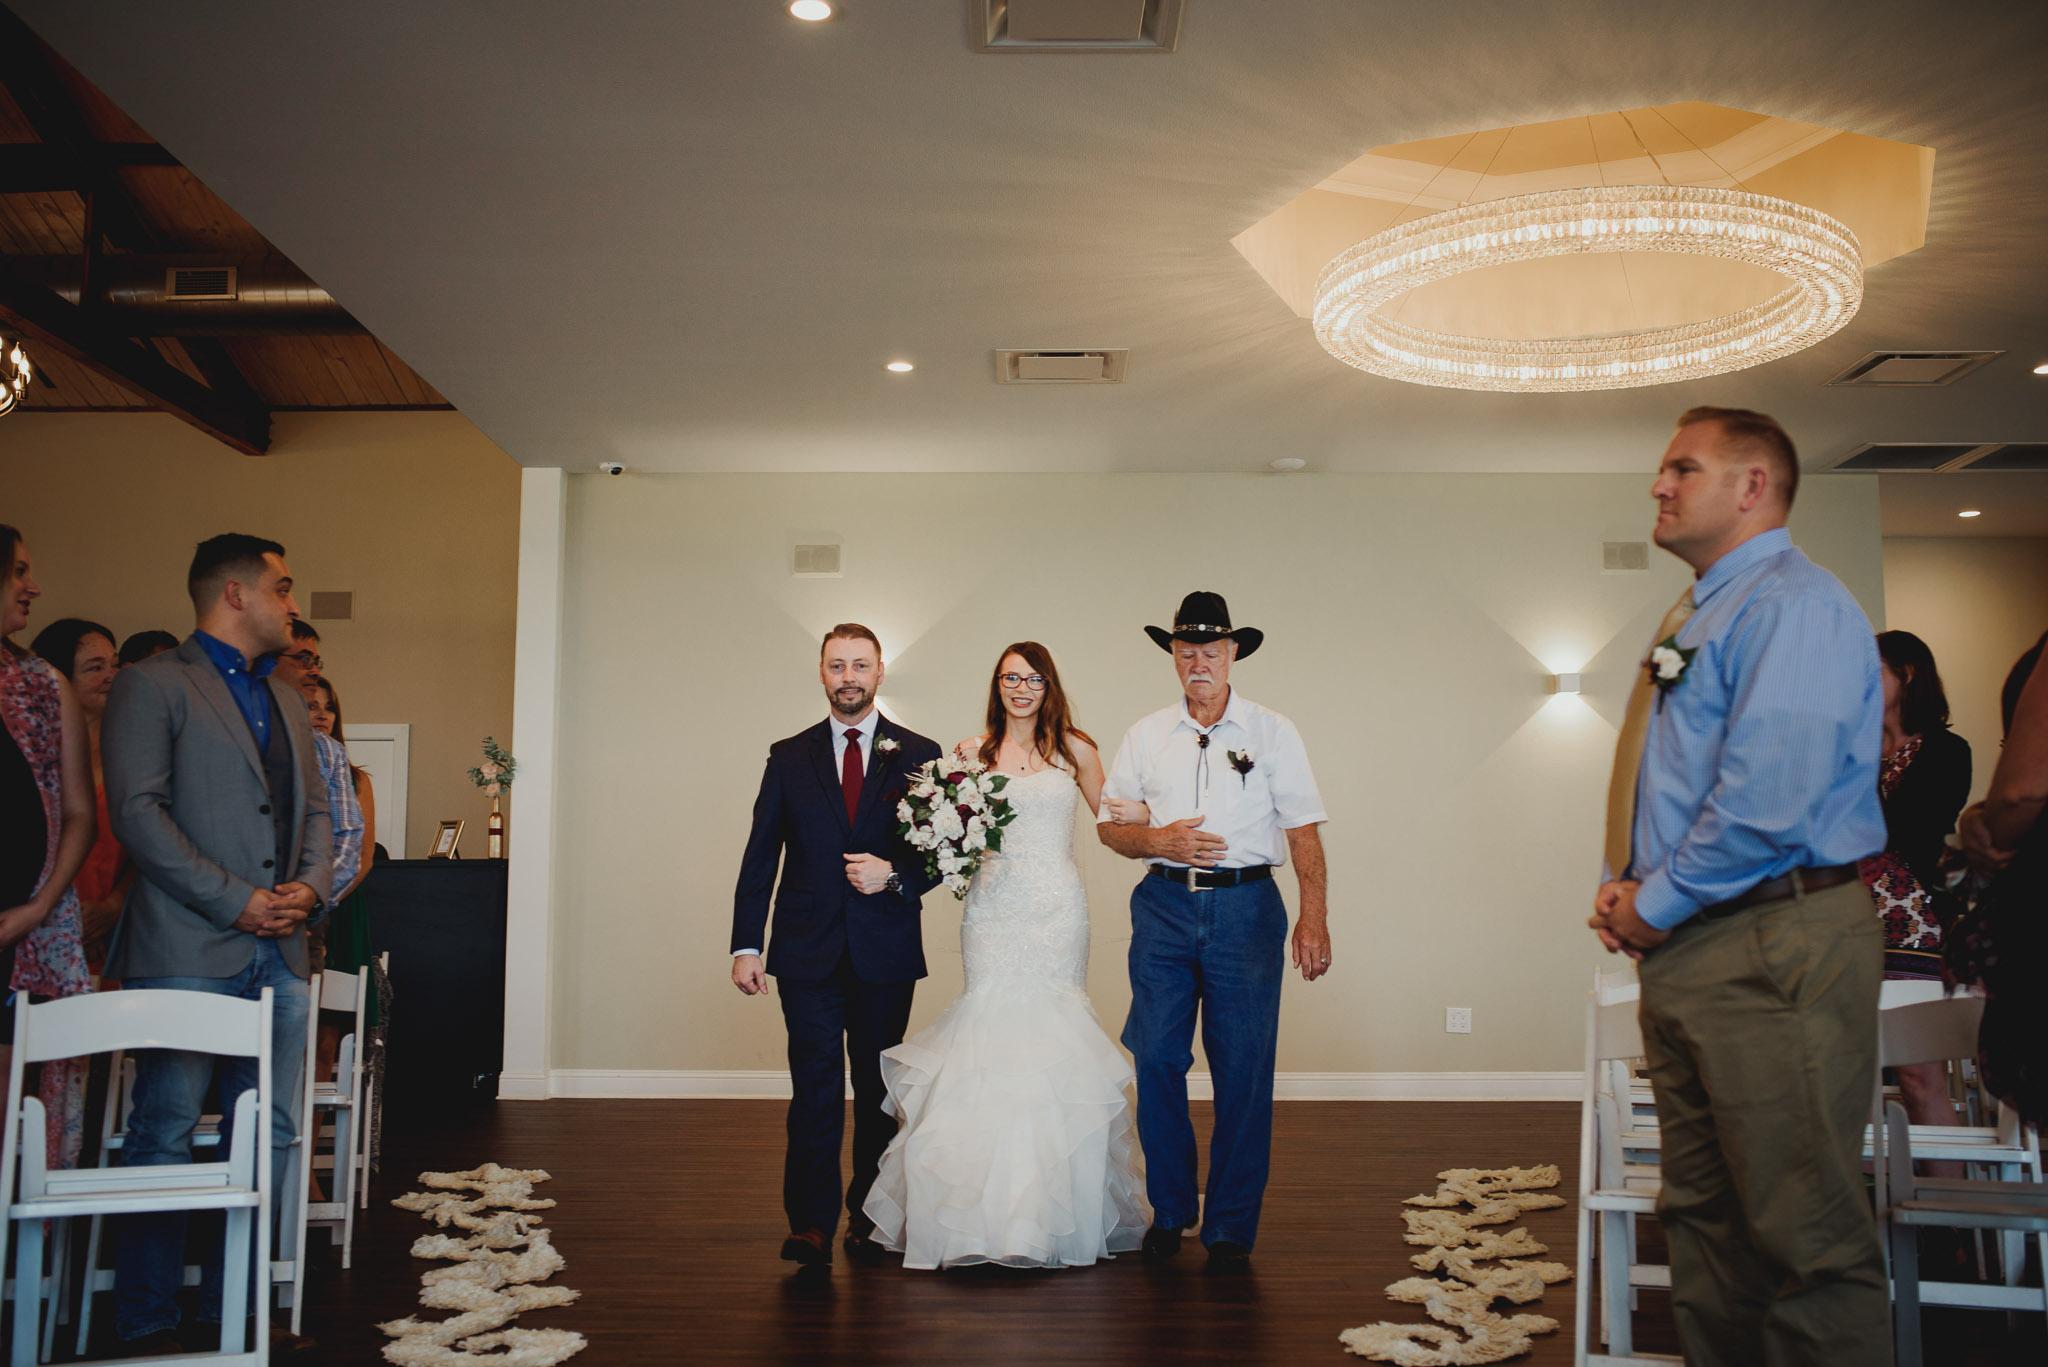 Austin-Texas-Wedding-Vintage-Villas-0023.jpg